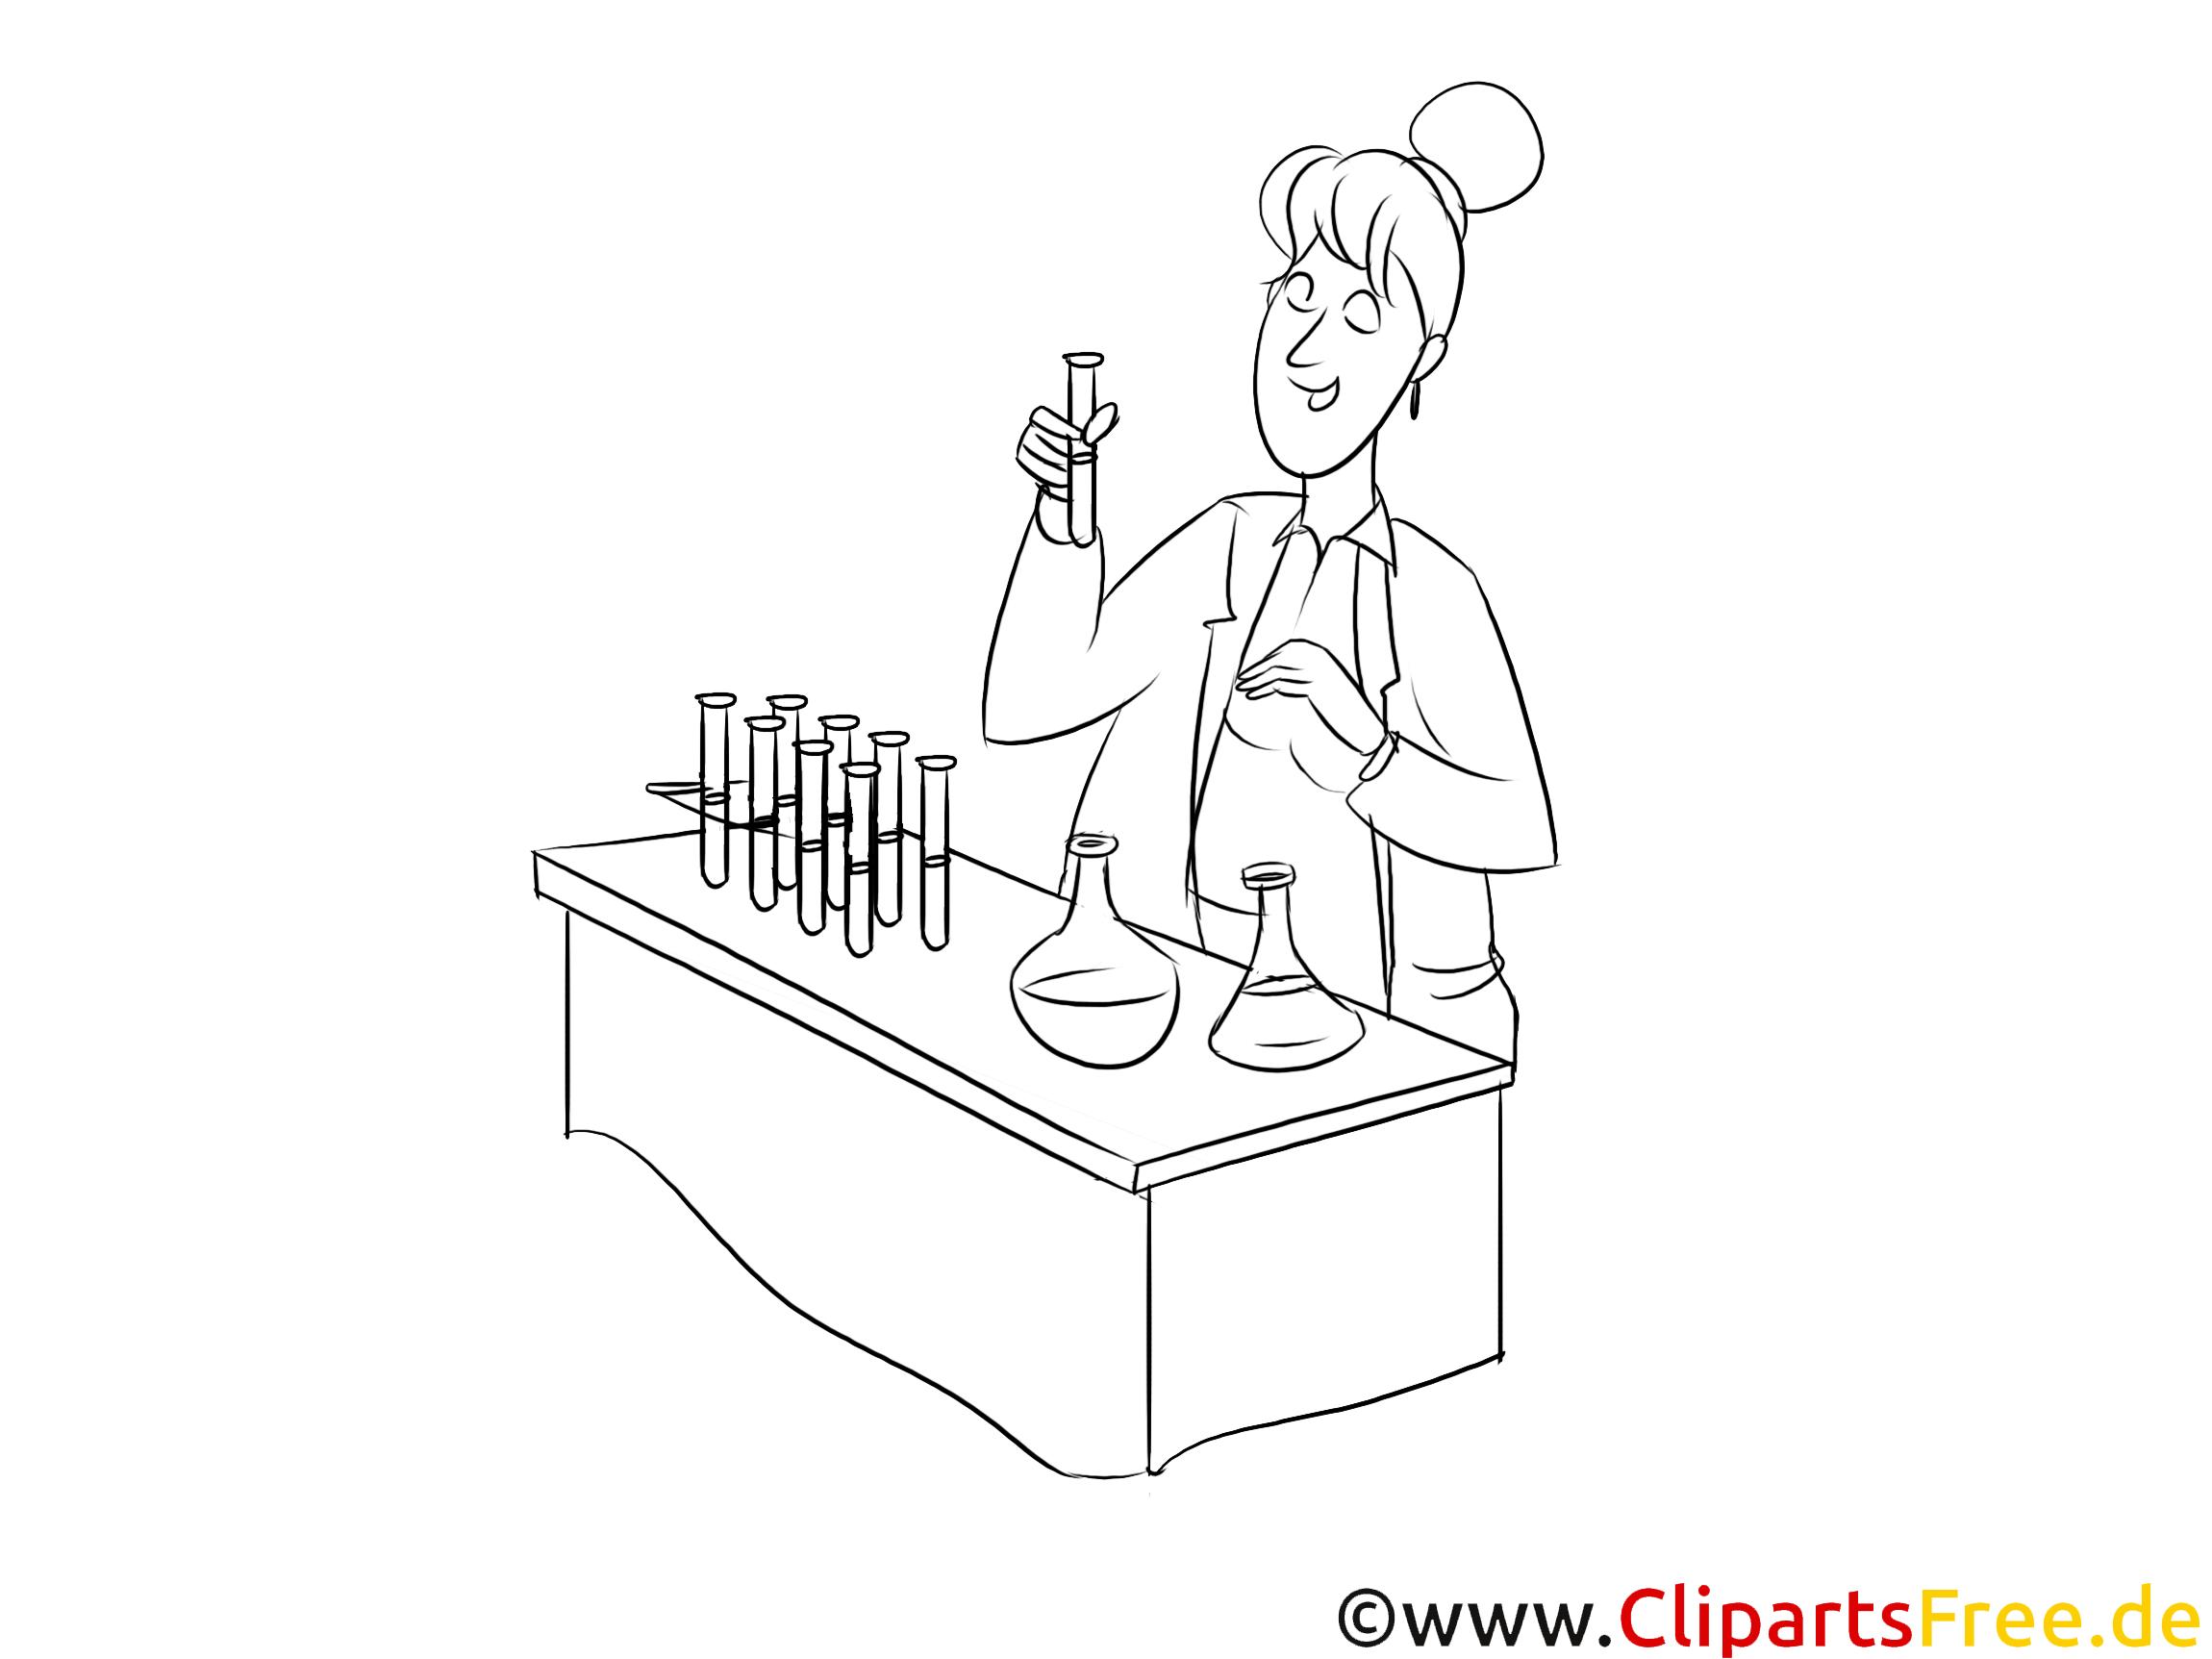 Chemielaborantin Clipart, Grafik, Bild schwarz-weiß